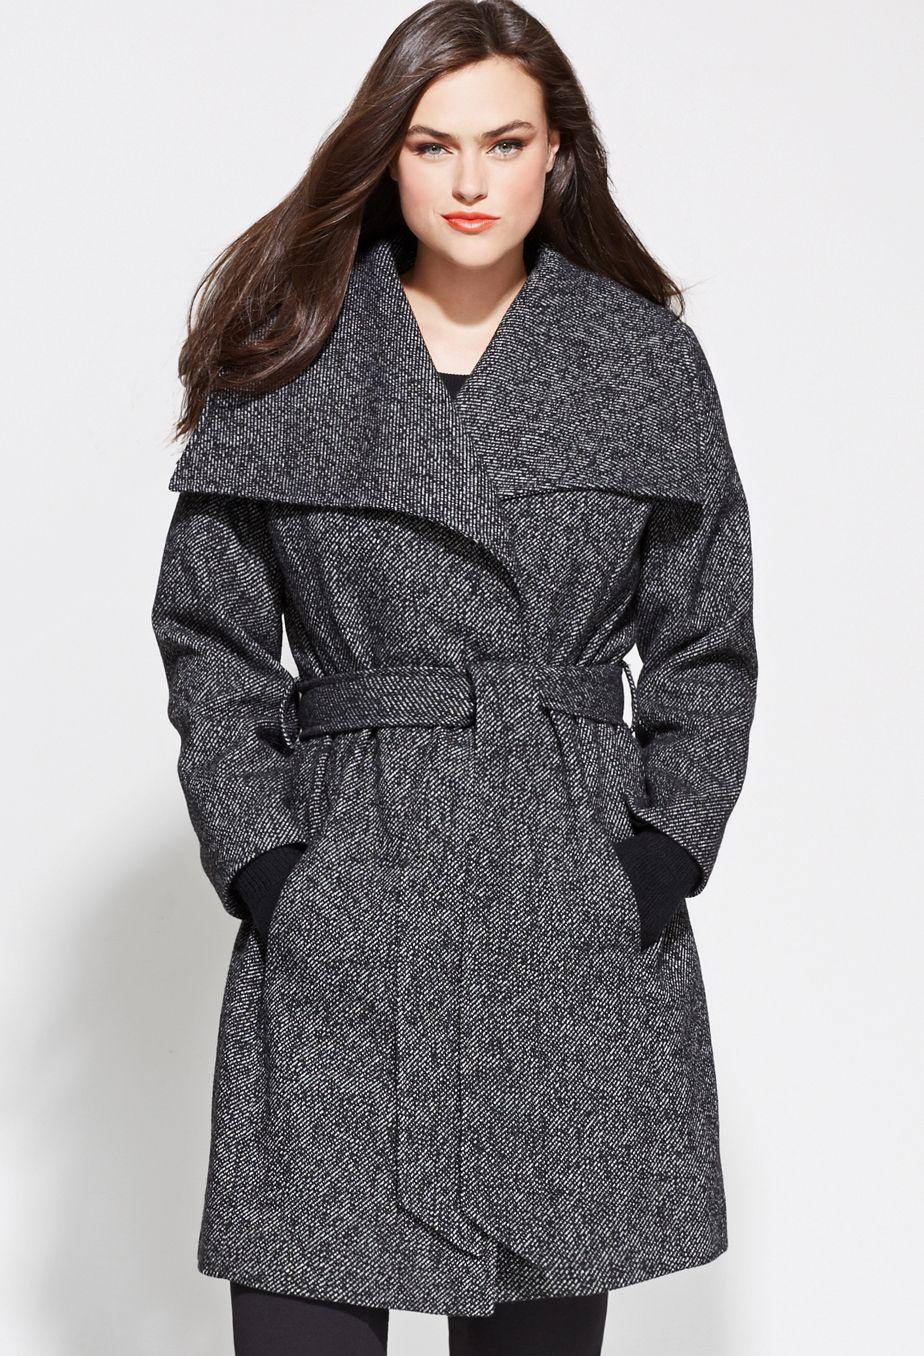 5f7cb0075397e Belted Tweed Coat